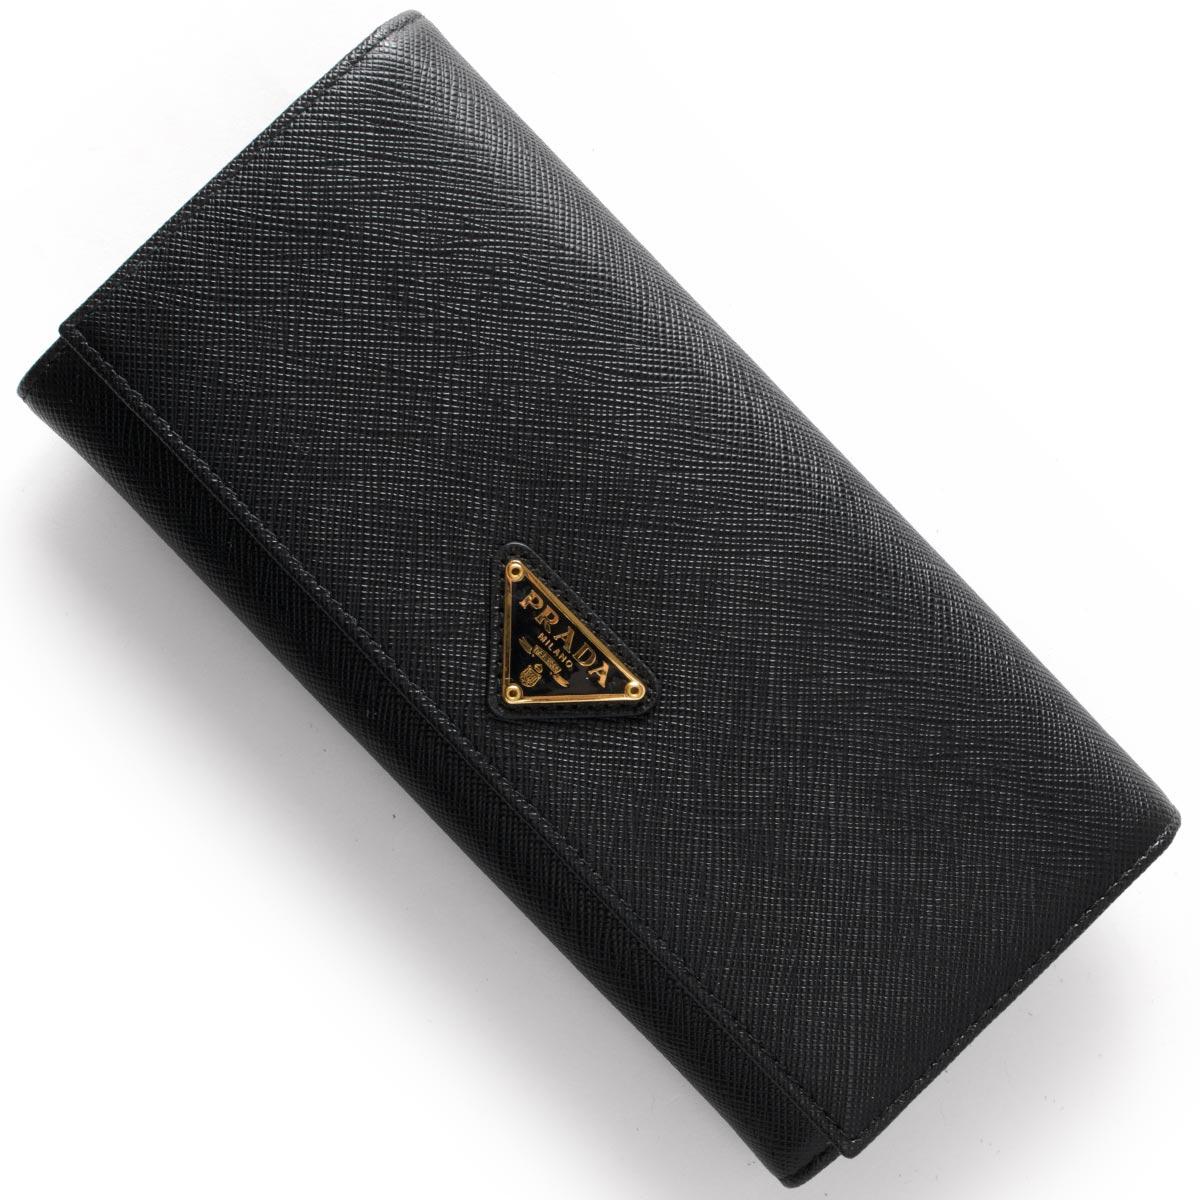 985685ed17b8 プラダ PRADA 長財布 SAFFIANO TRIANG 三角ロゴプレート ブラック 1MH132 QHH F0002 メンズ